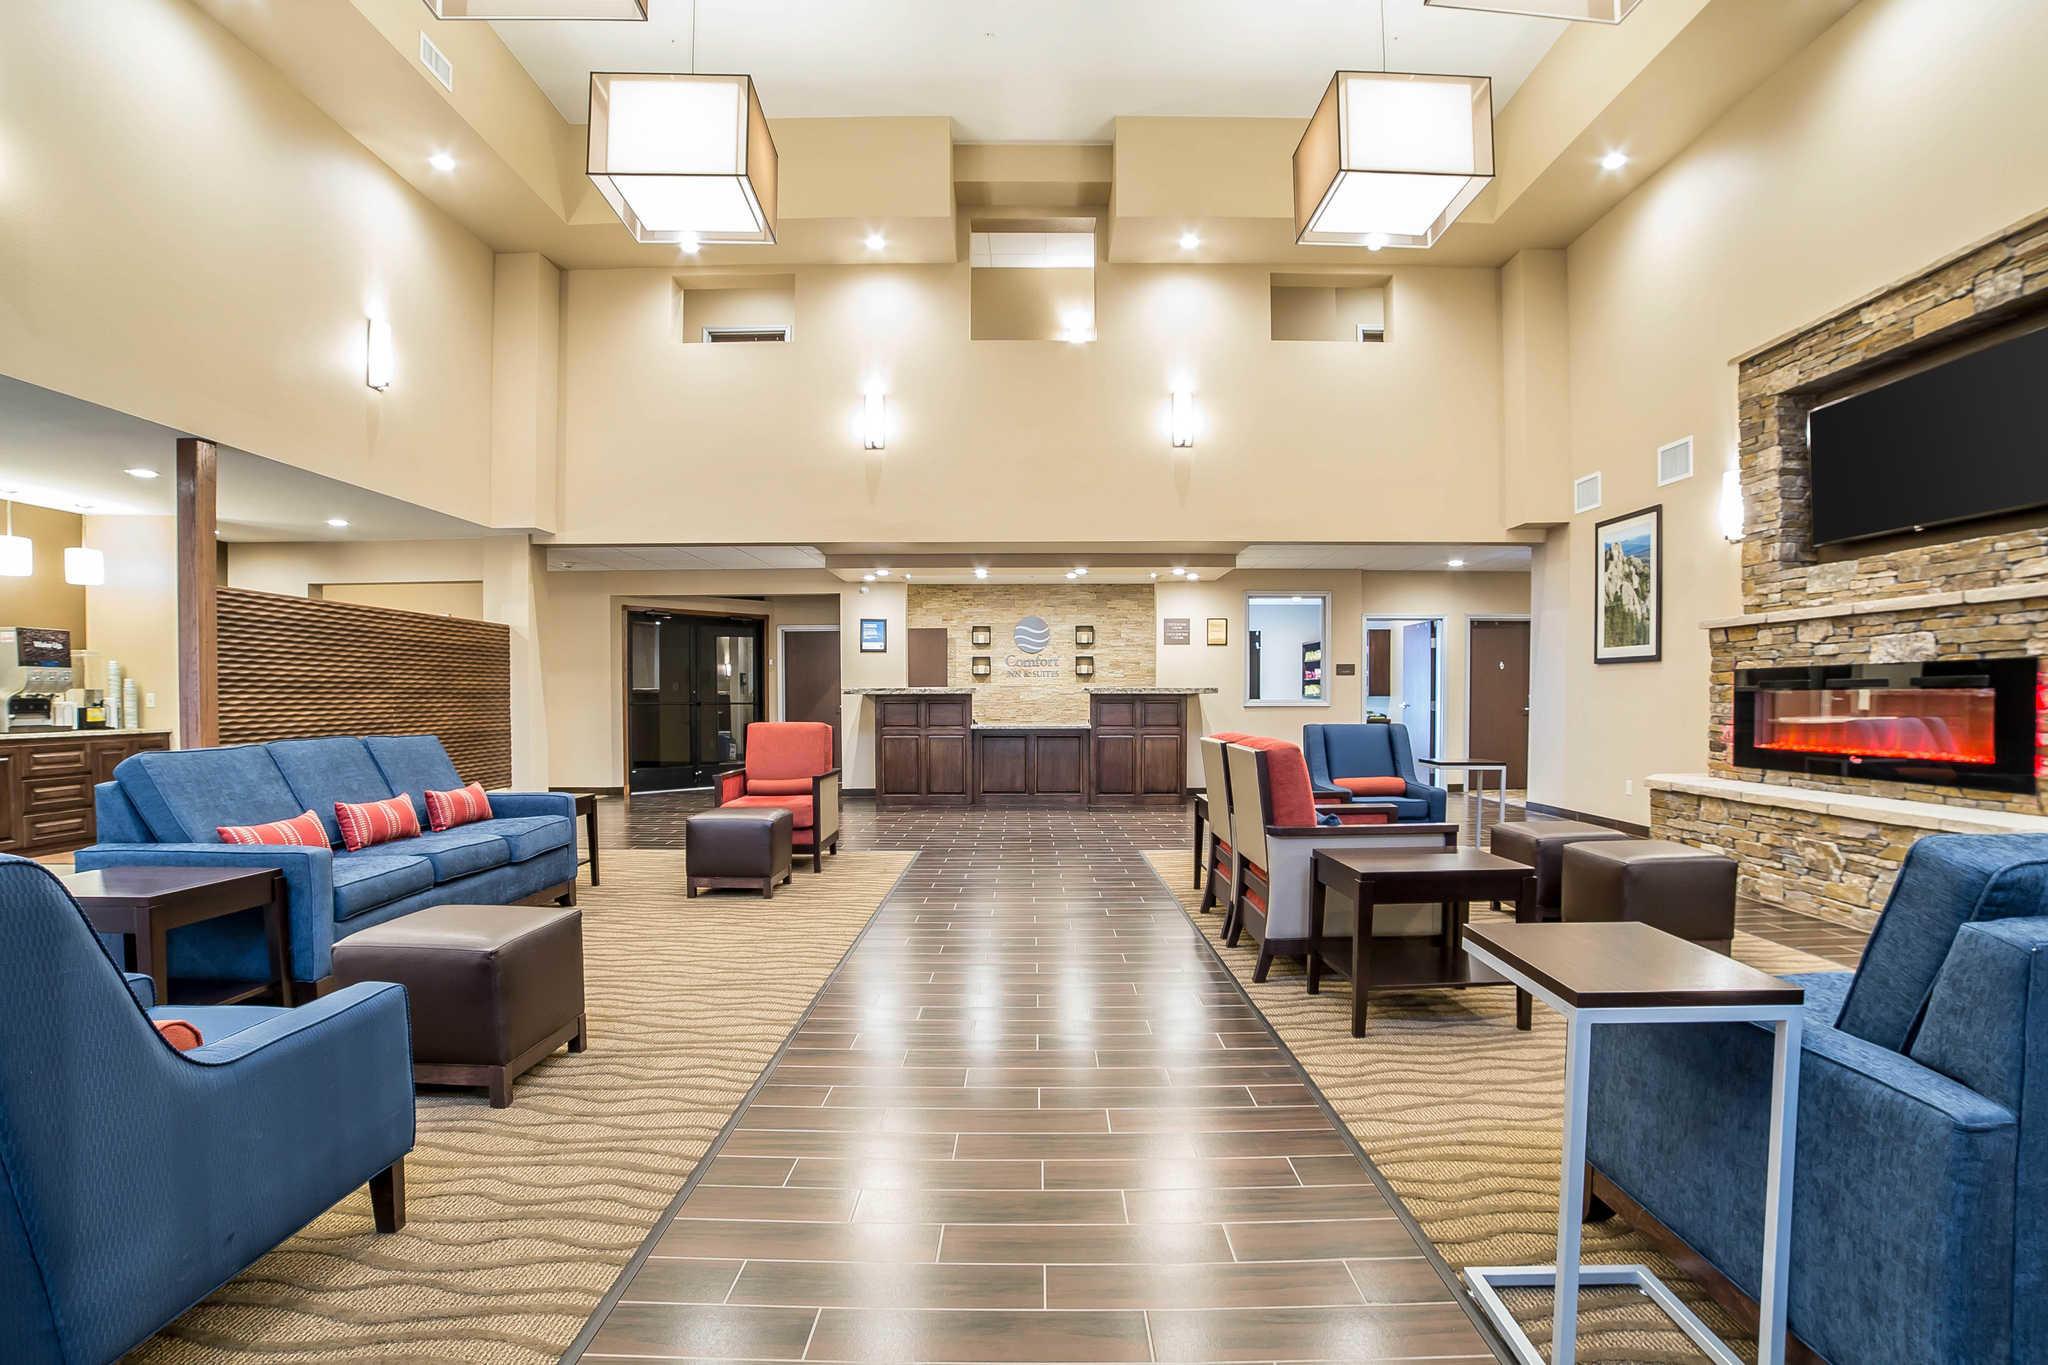 Comfort Inn & Suites Near Mt. Rushmore image 0